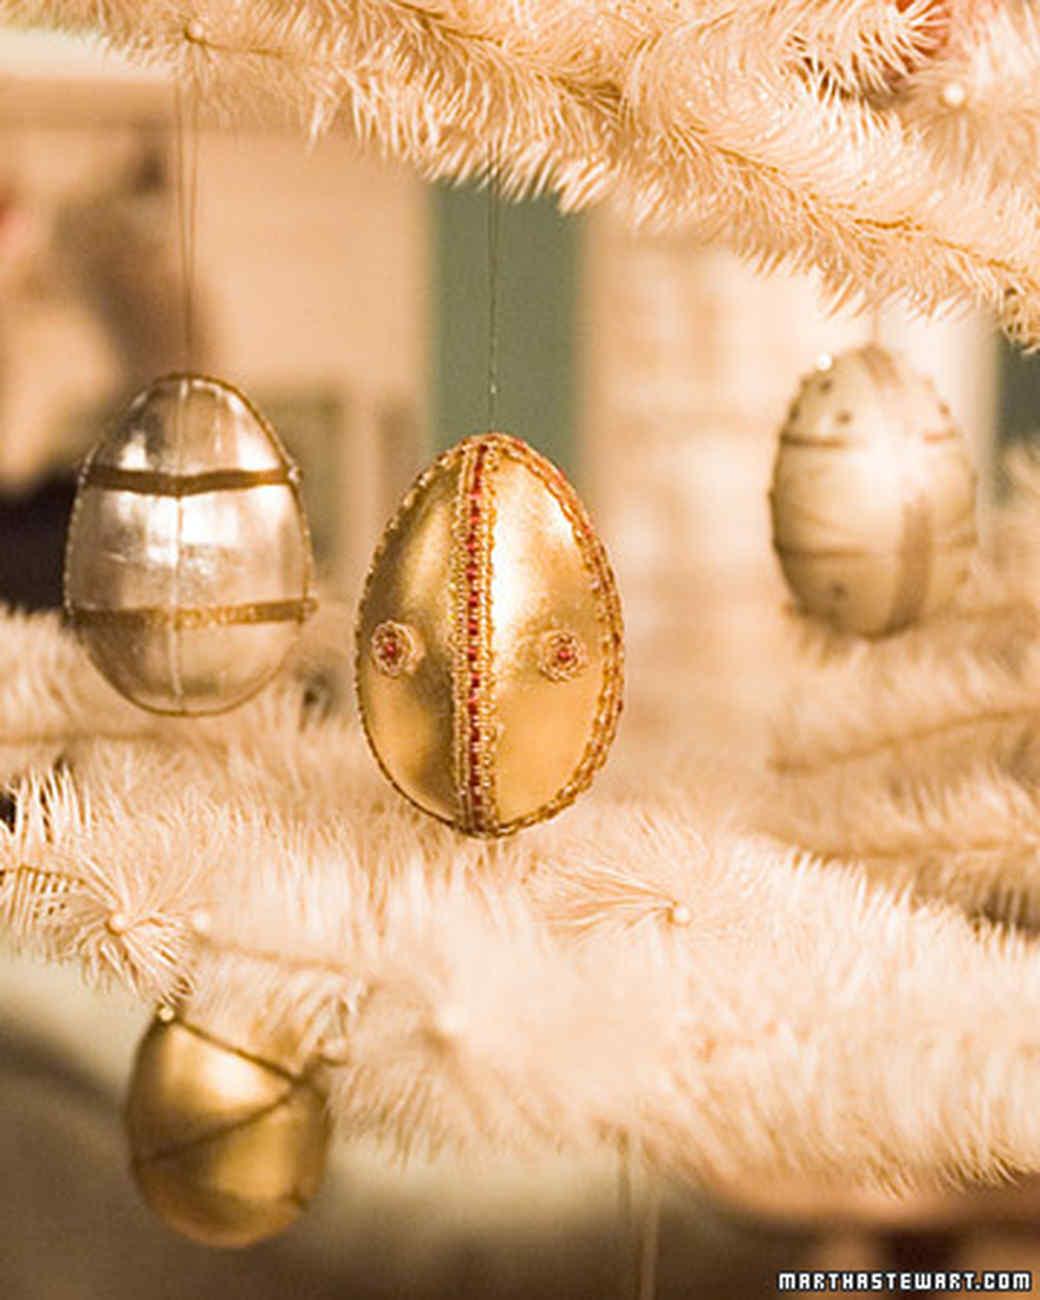 faberge egg ornaments - Cardboard Box Christmas Decorations